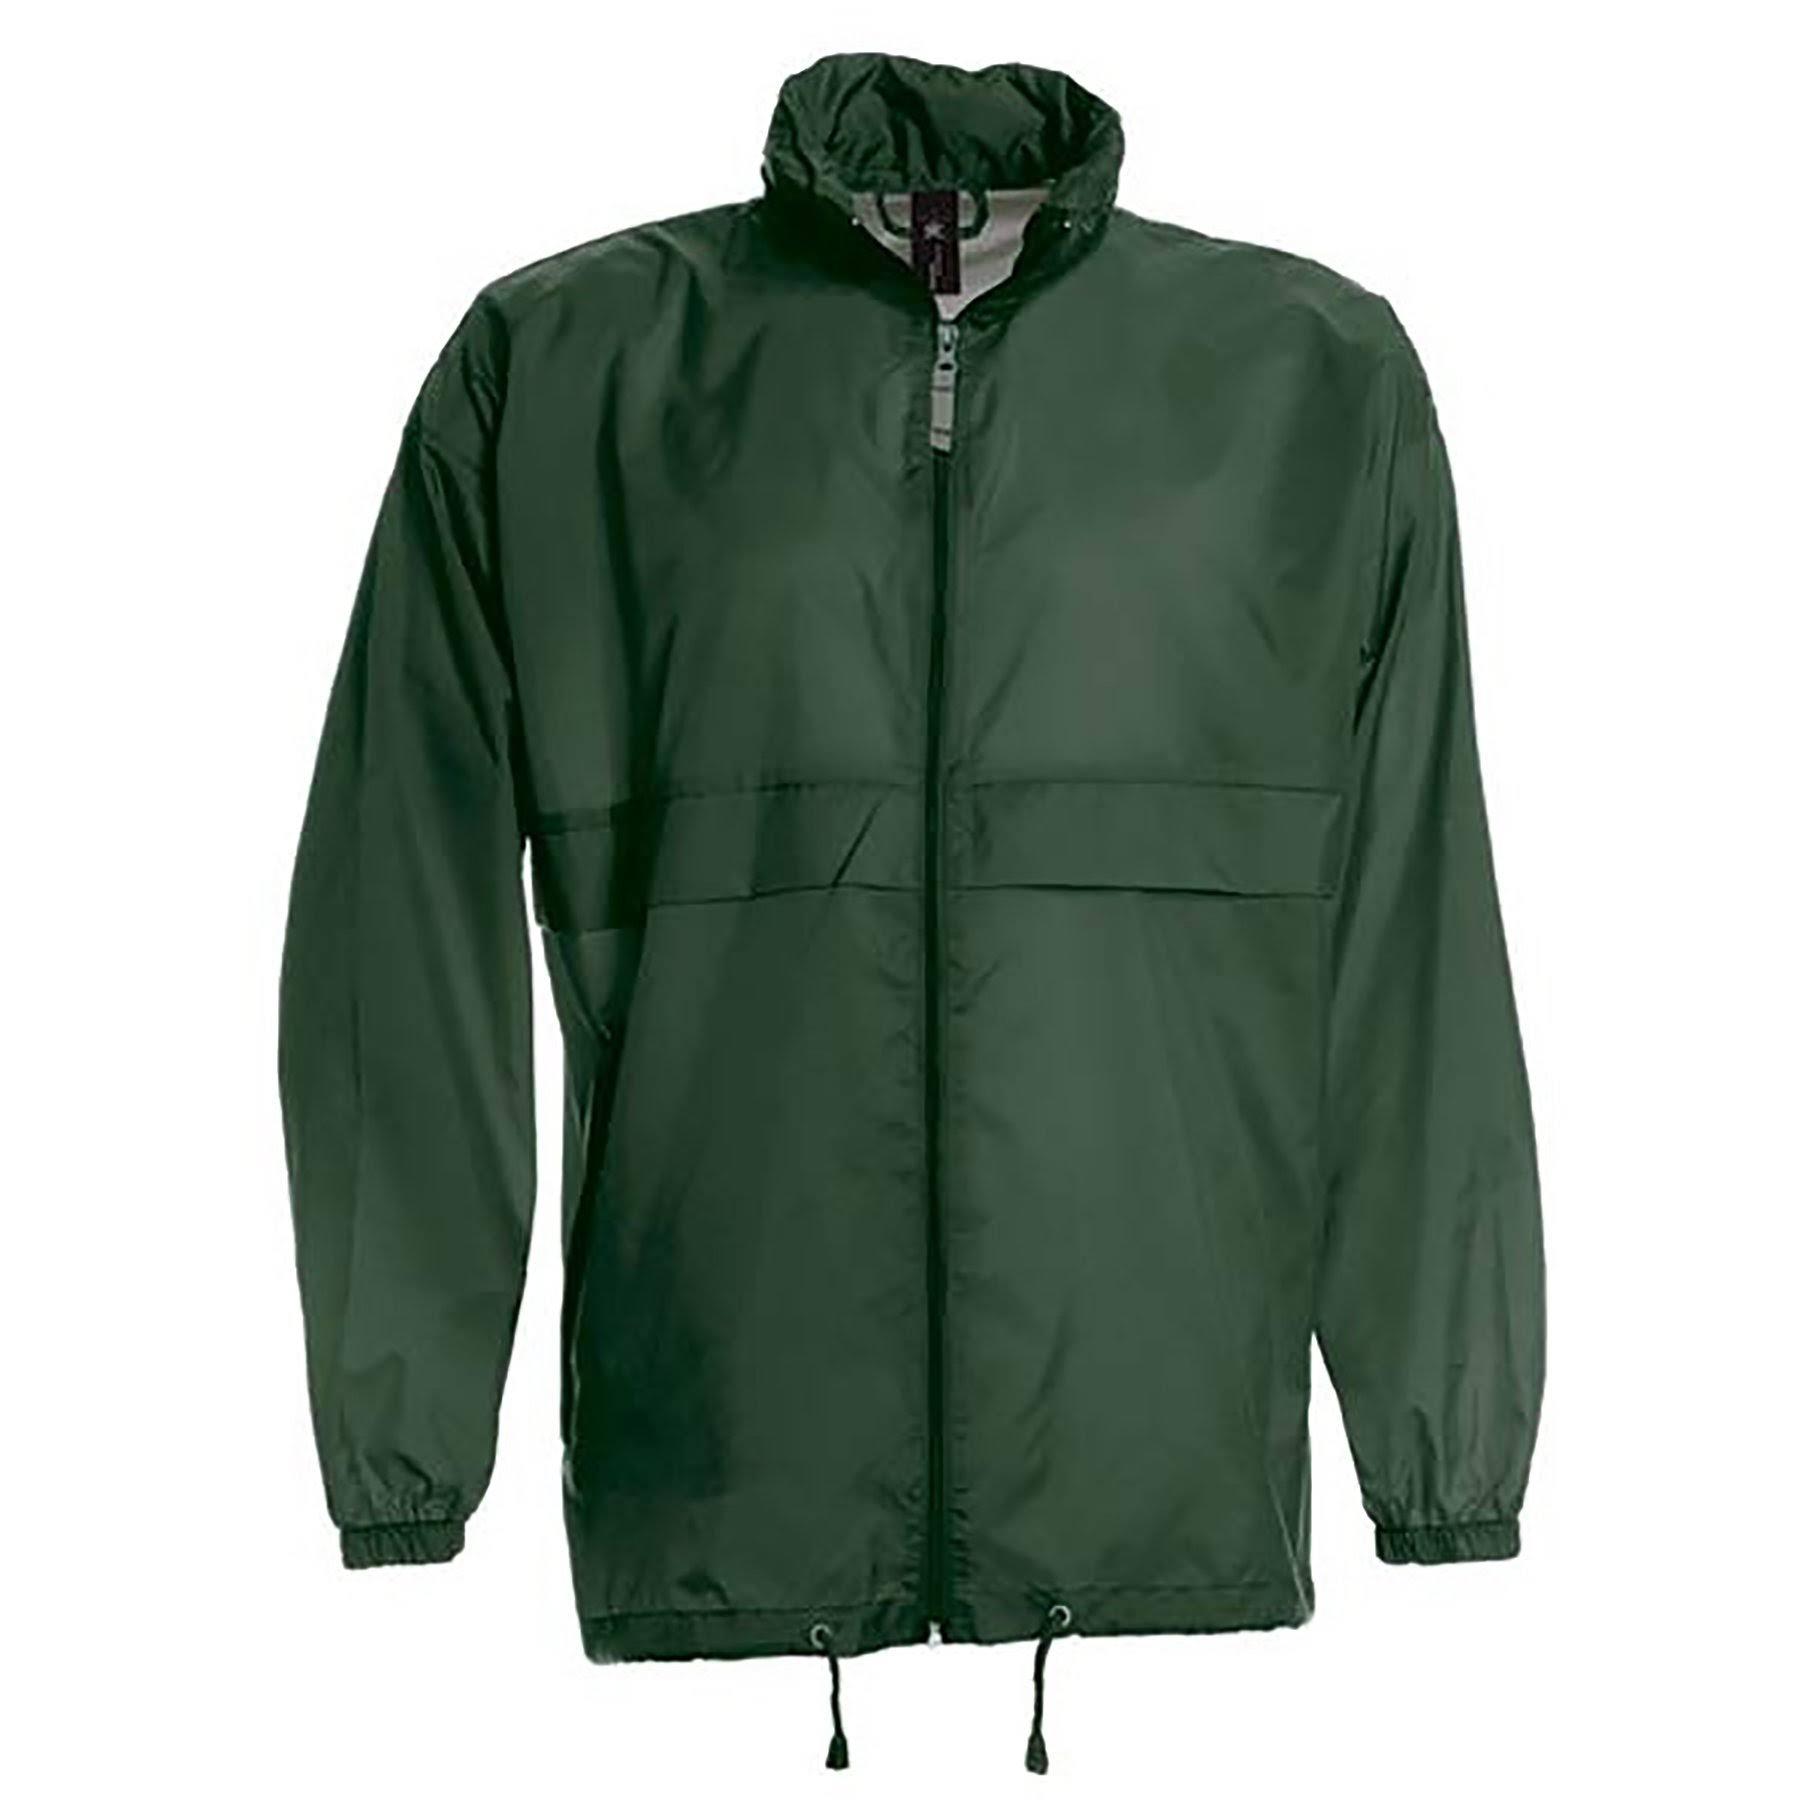 Leichte C Mens Green B Jacken Jacke amp; Sirocco 14 Utbc102 Bottle 47qfFI5